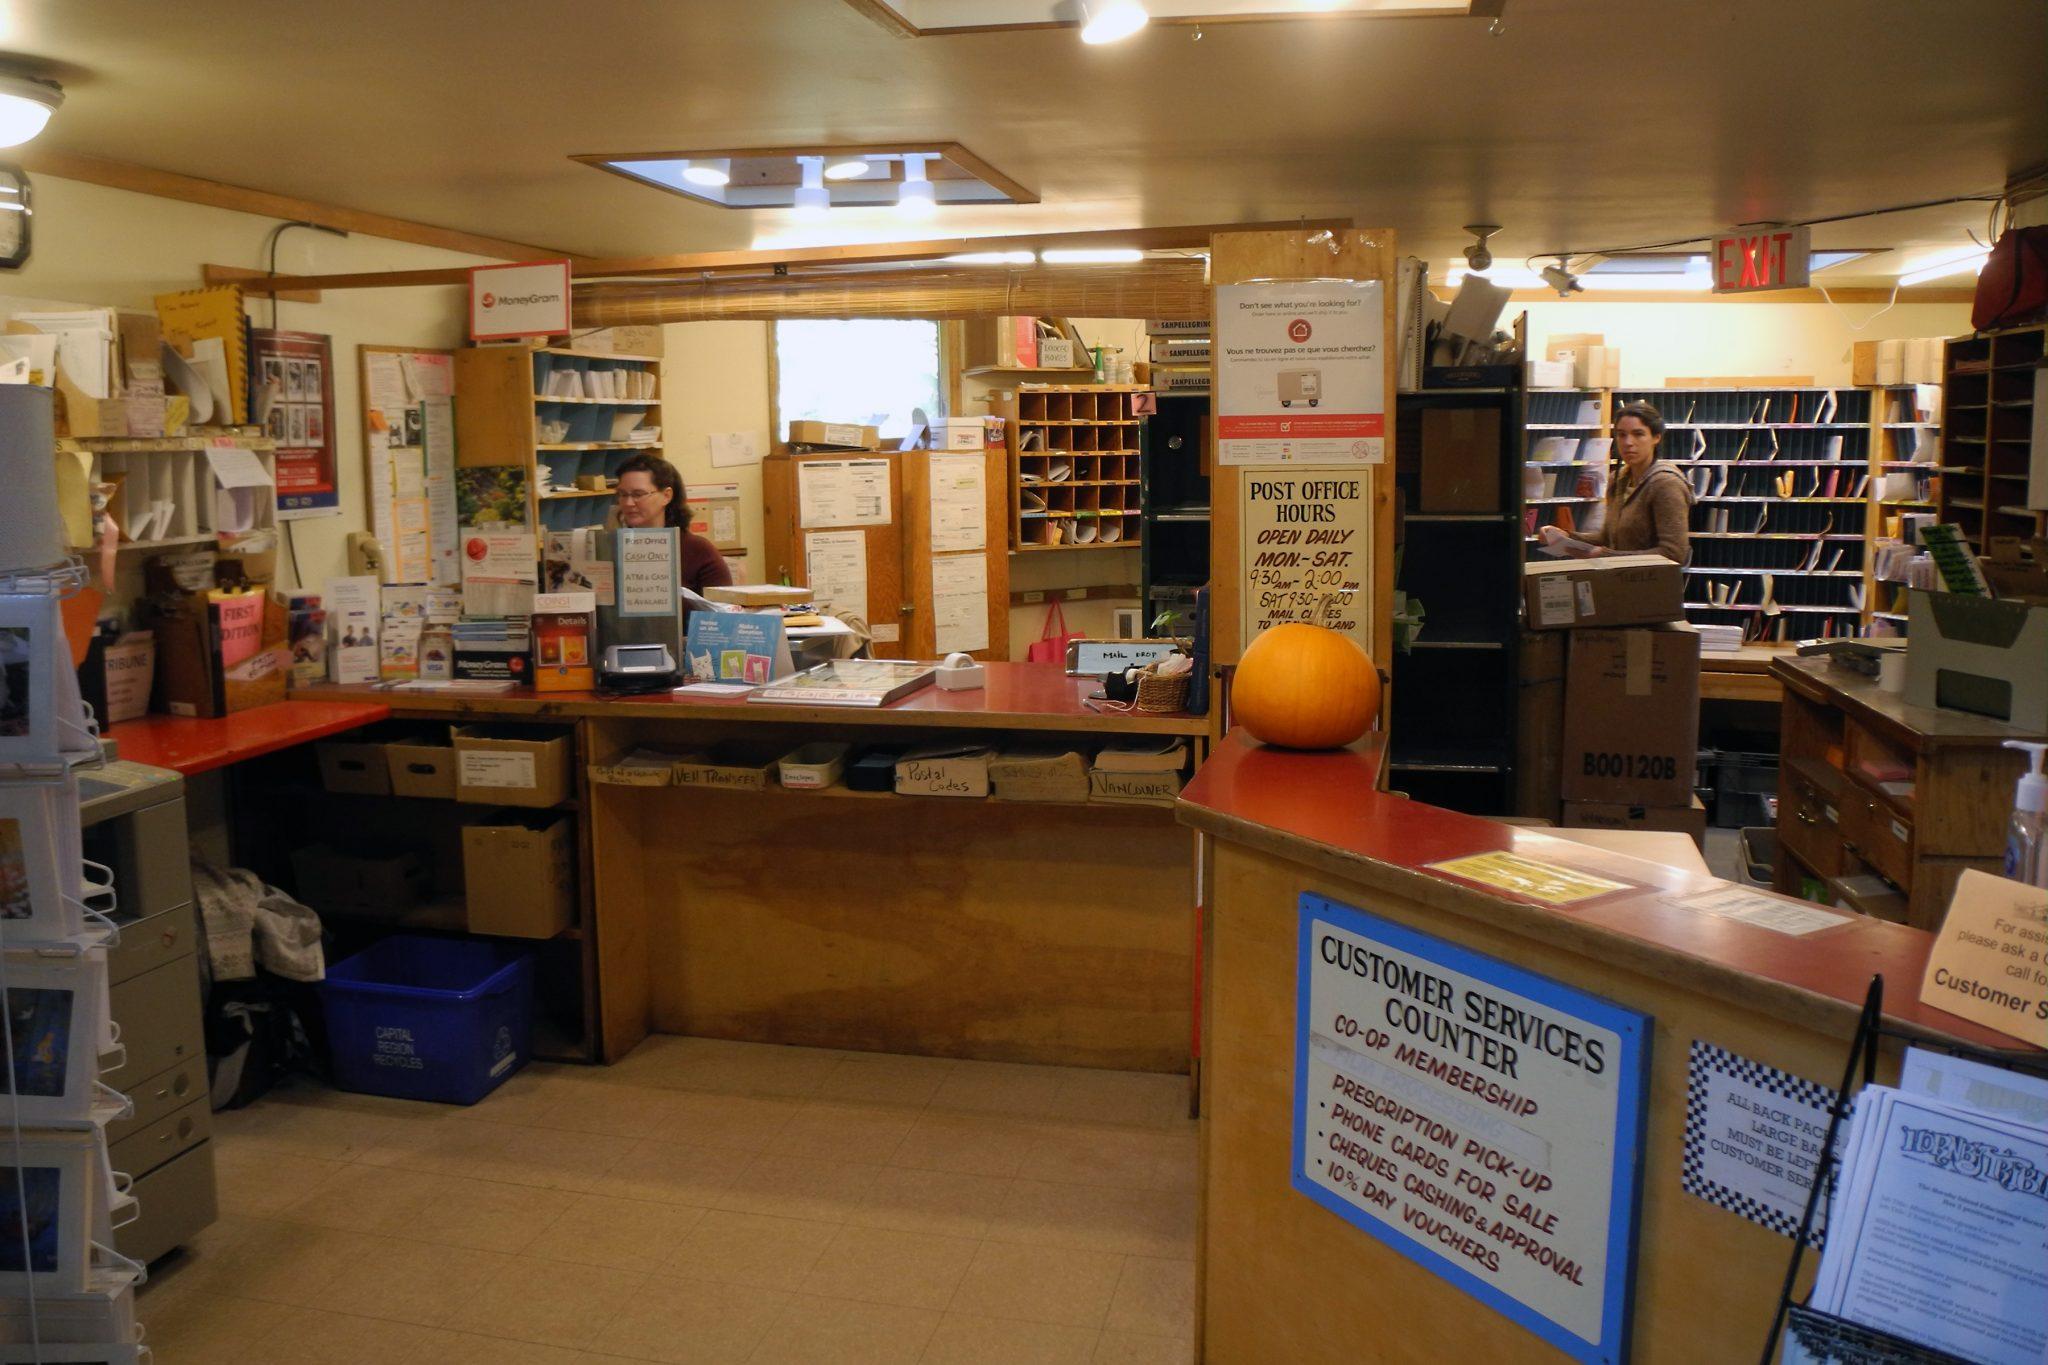 Hornby Island Co-op Post Office